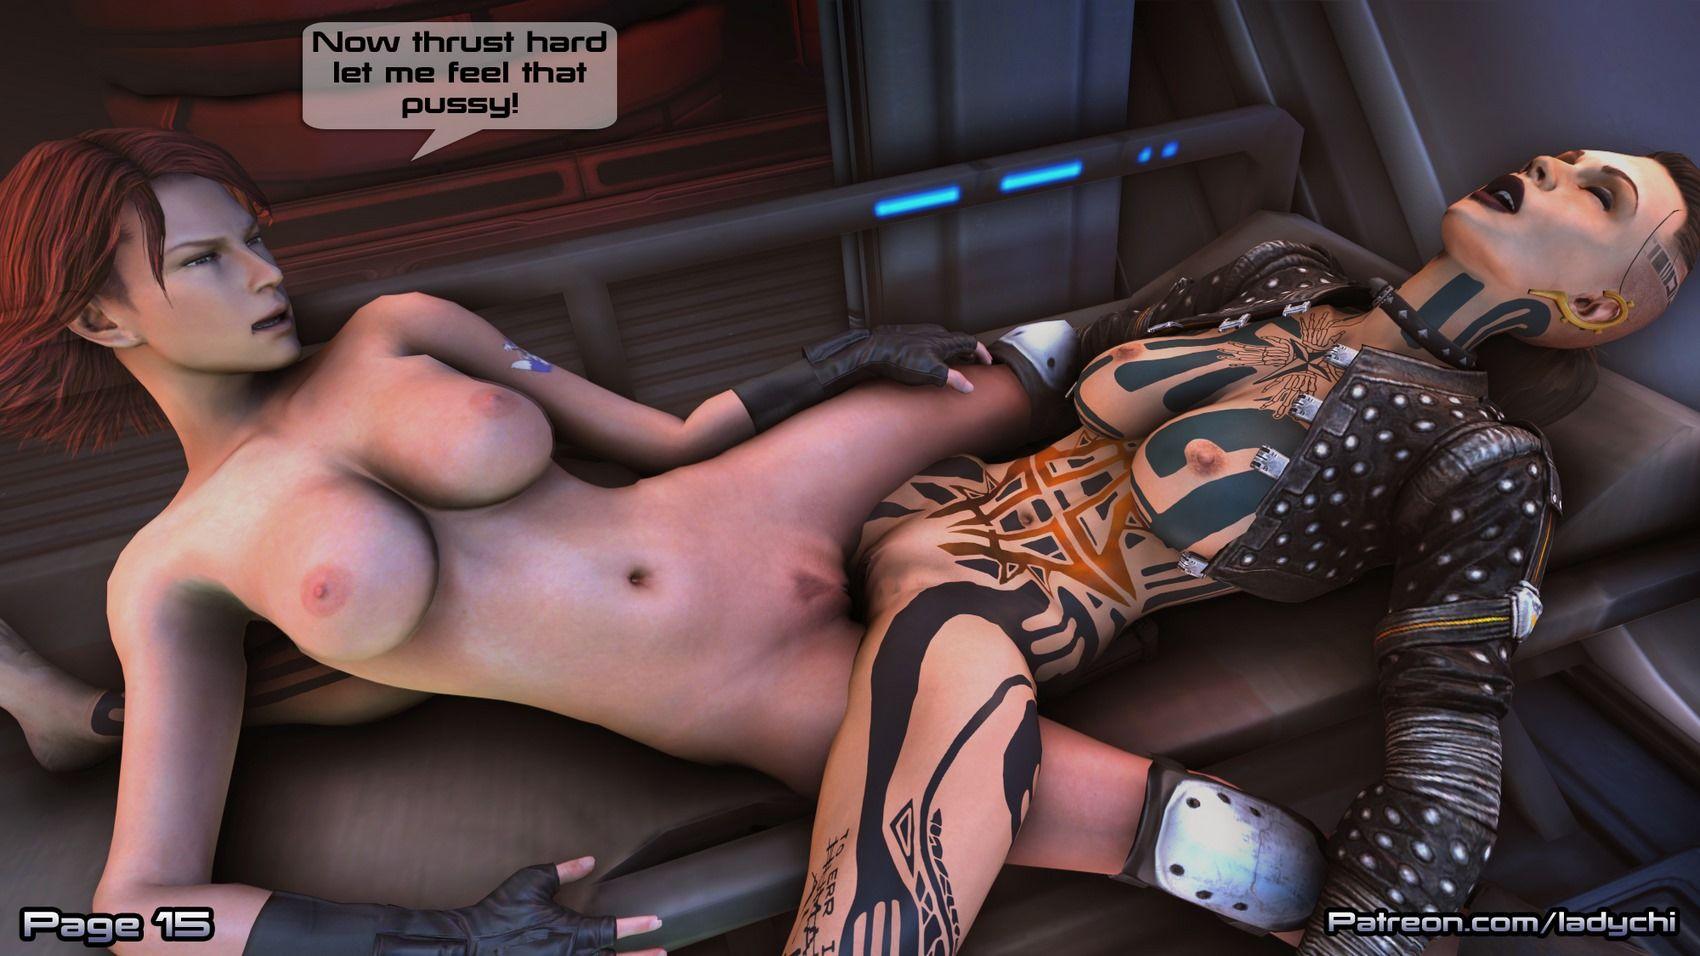 Jacks_Dream_Ladychi_(Mass_Effect) comix_57870.jpg